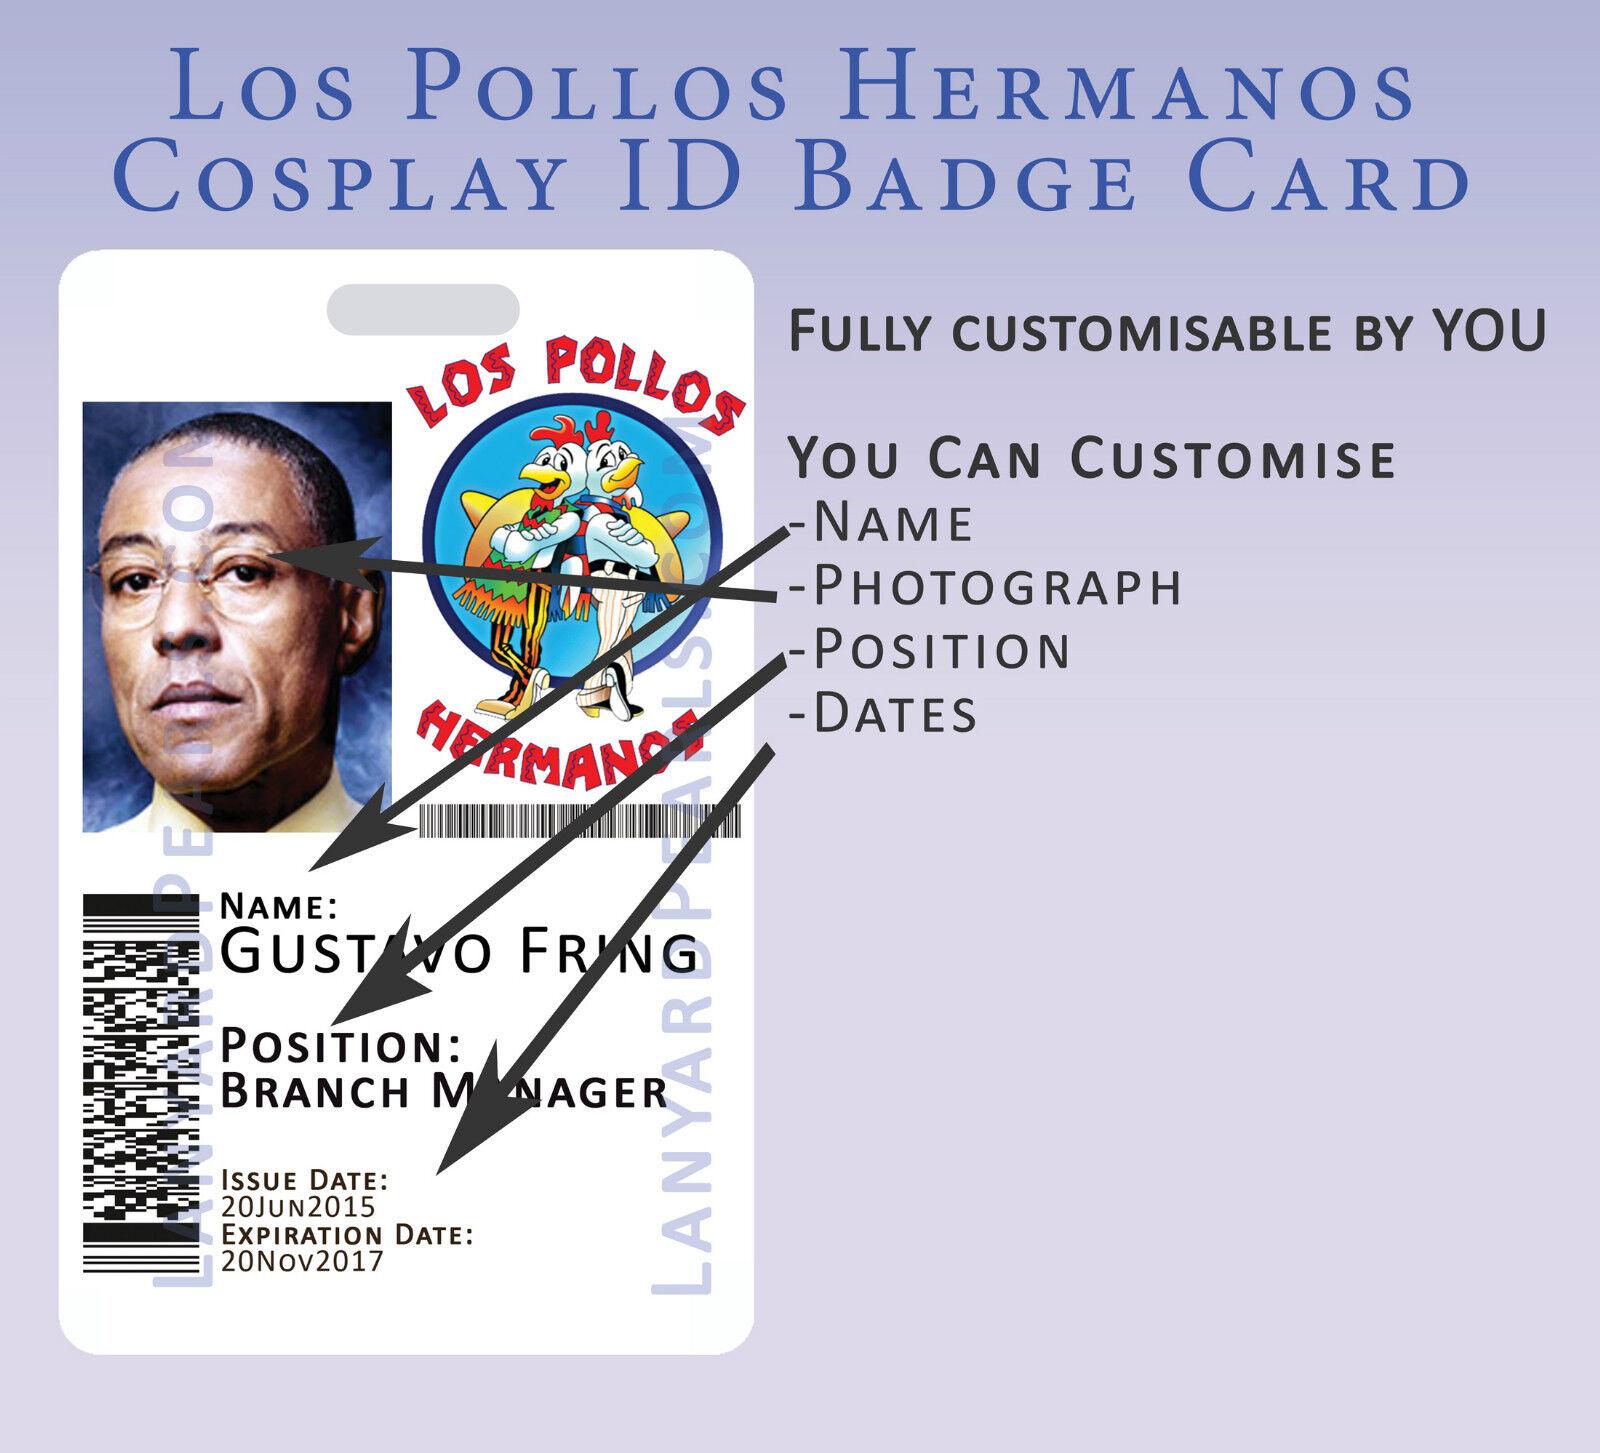 Los Pollos Hermanos - Breaking Bad - Novelty Cosplay ID Badge Card